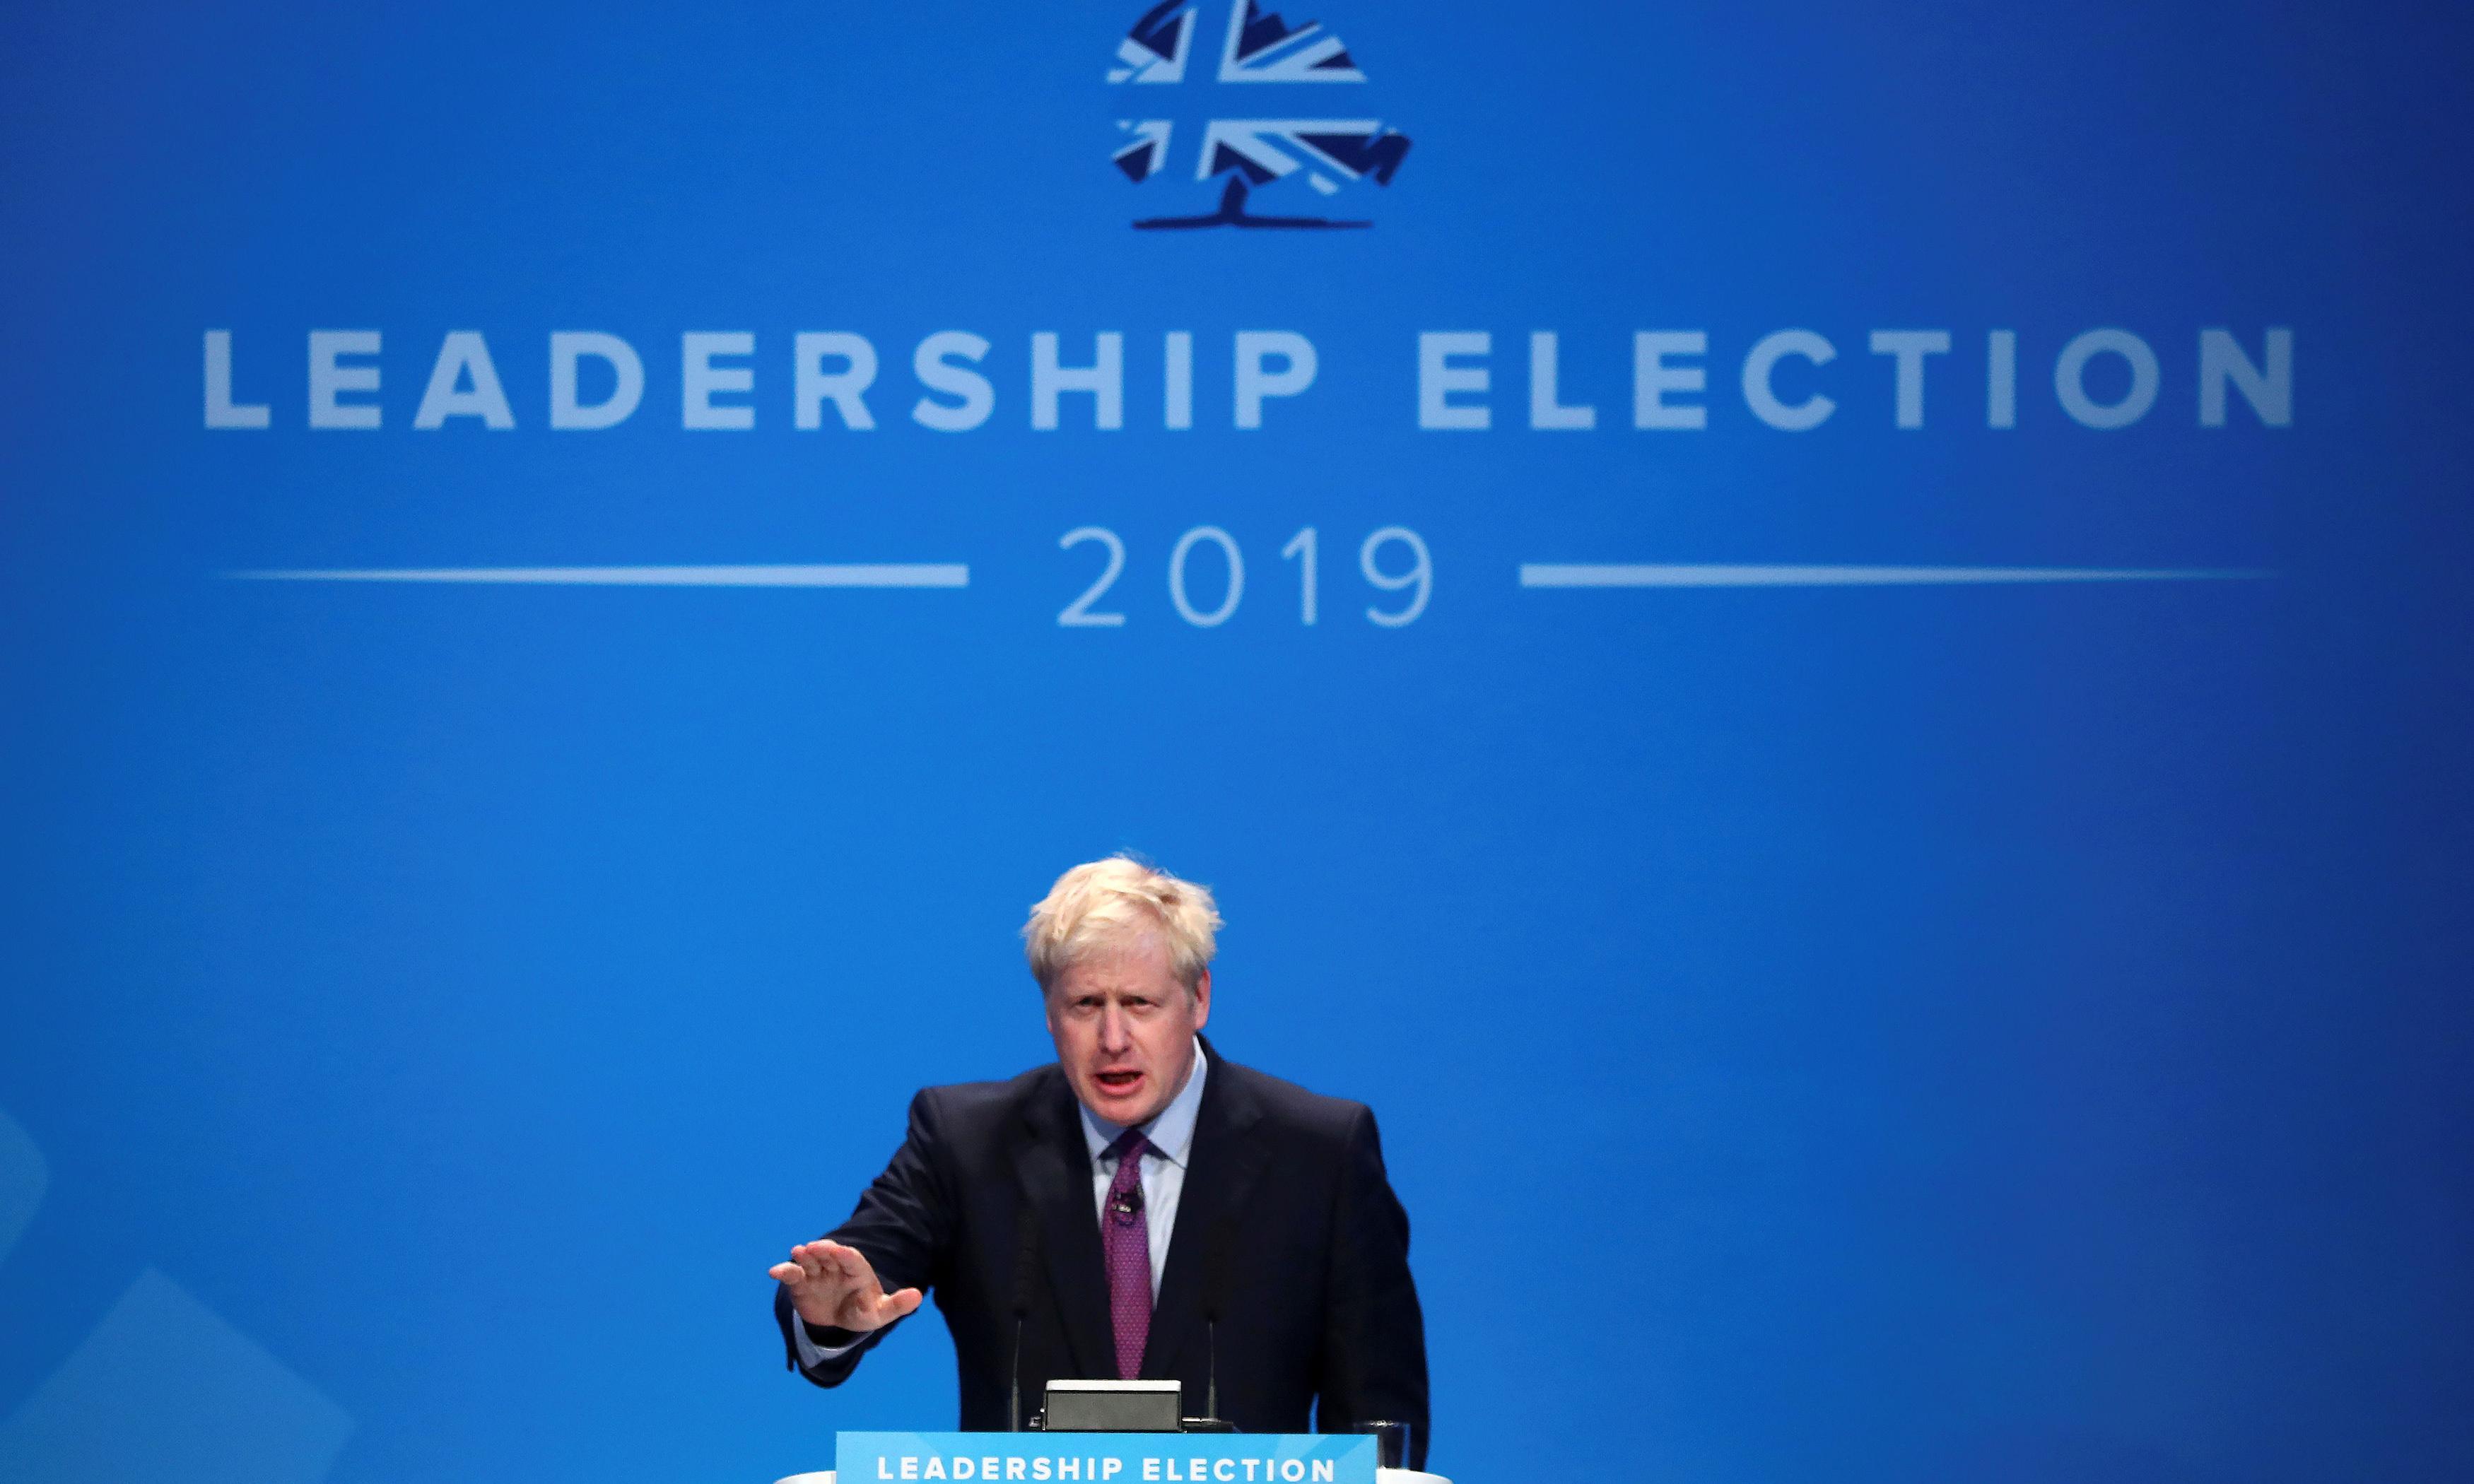 'Why take risks?': Boris Johnson's team keep candidate on tight leash